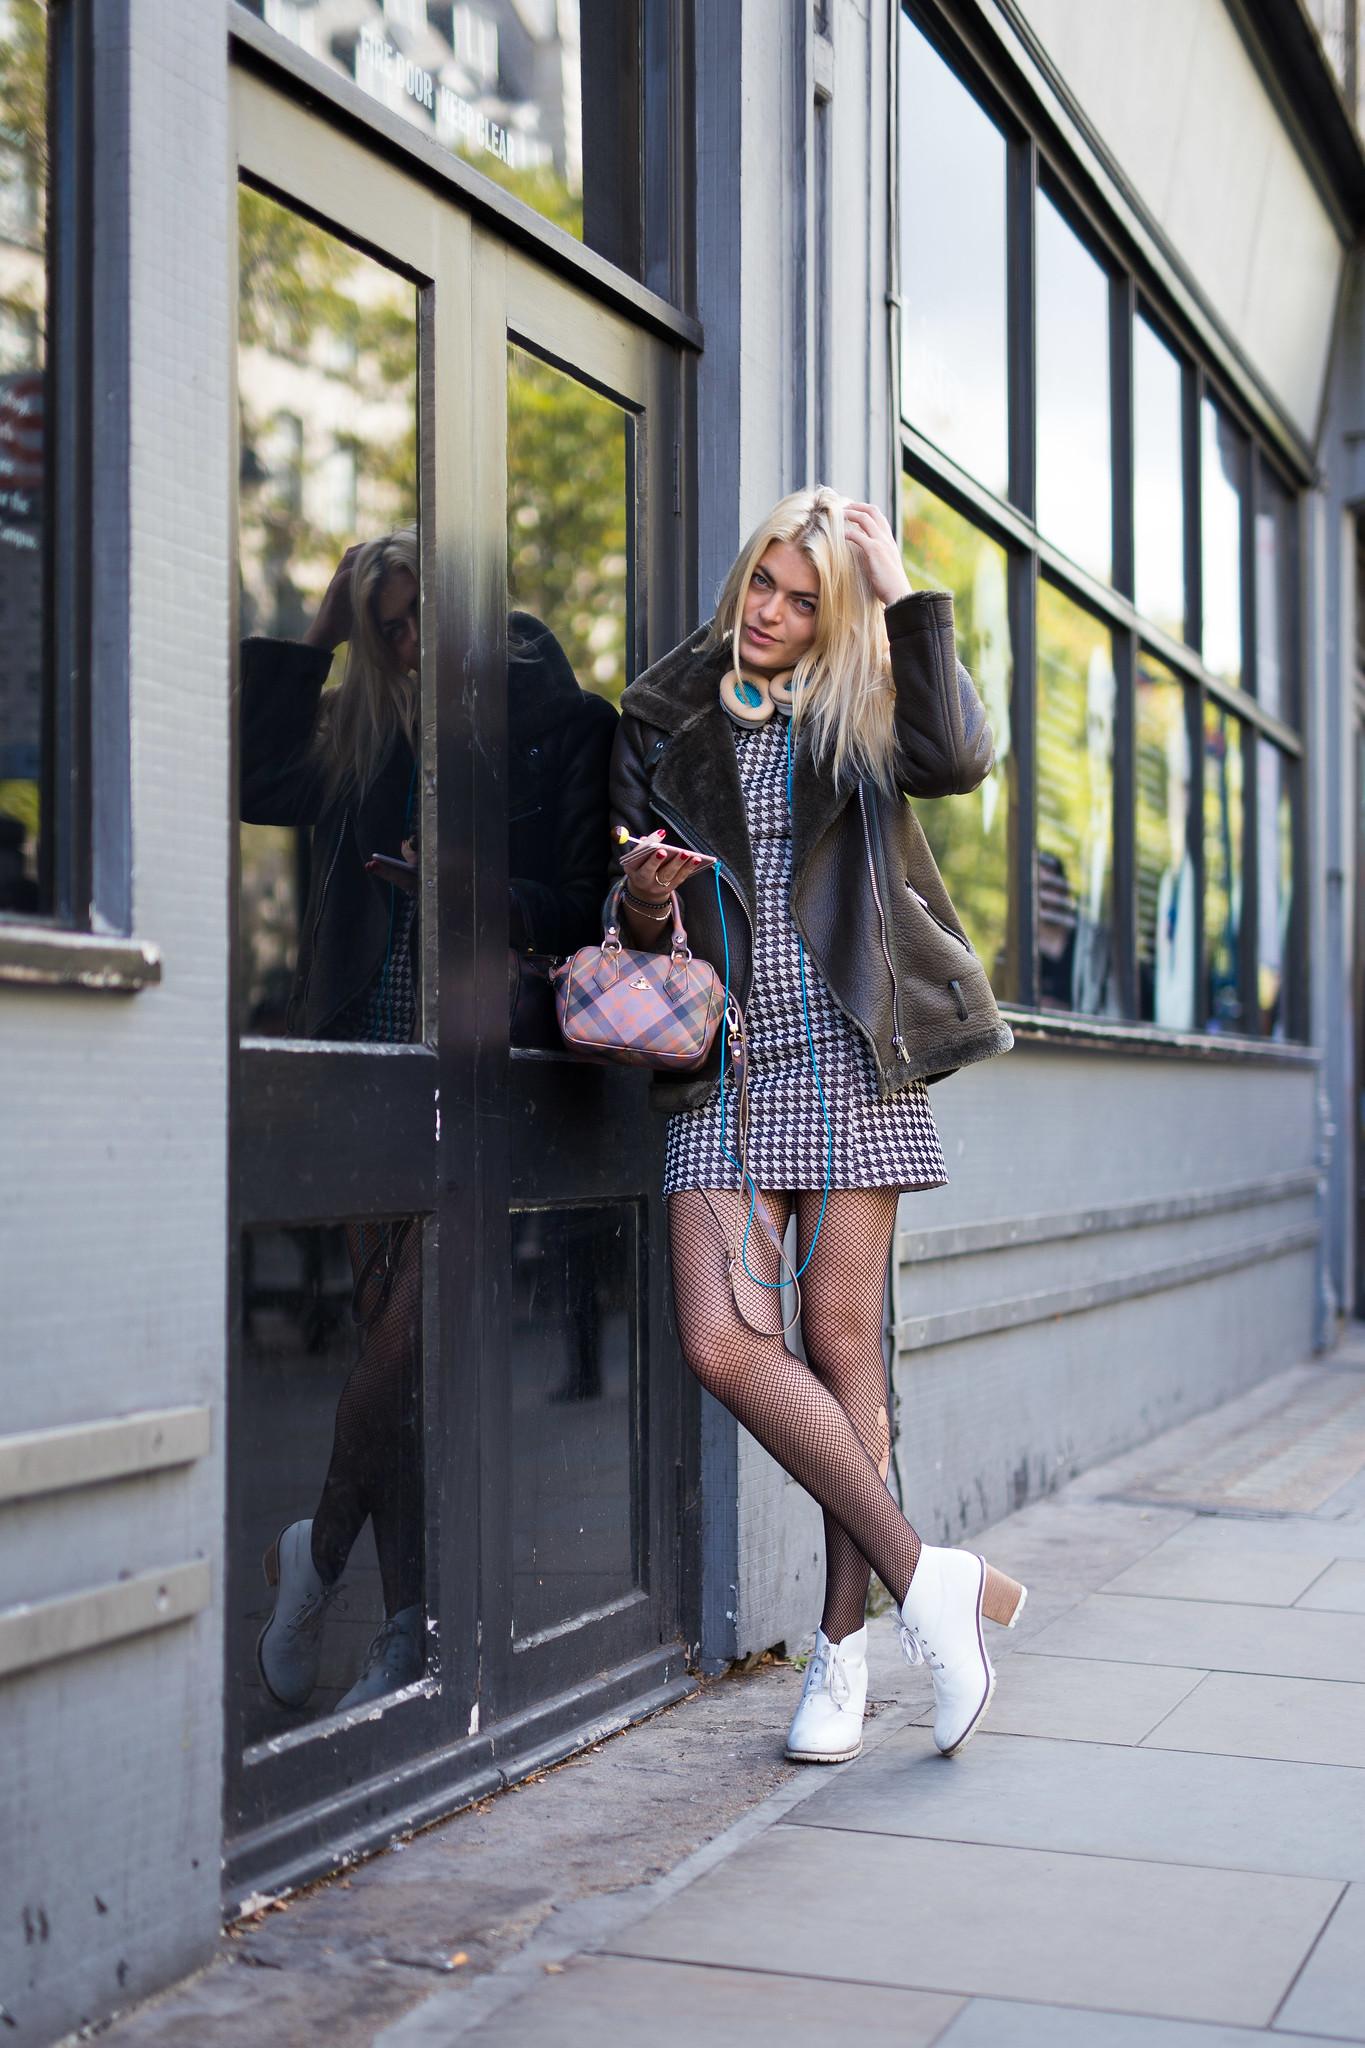 Street Style - Laura Doggett, London Fashion Week